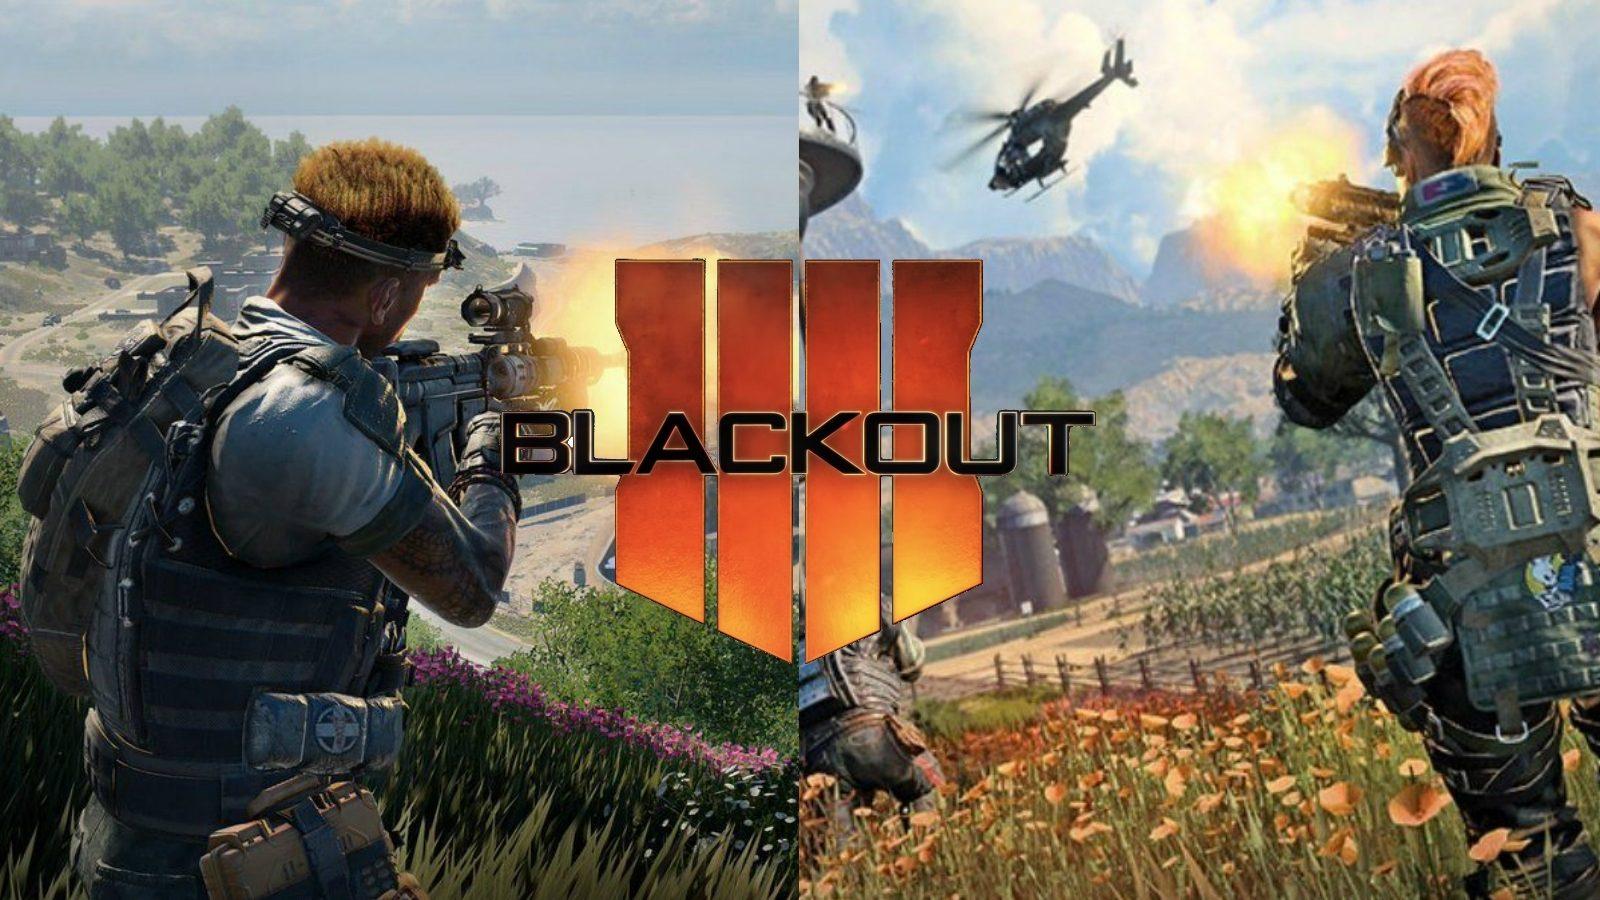 Call of Duty Blackout - Battle Royale